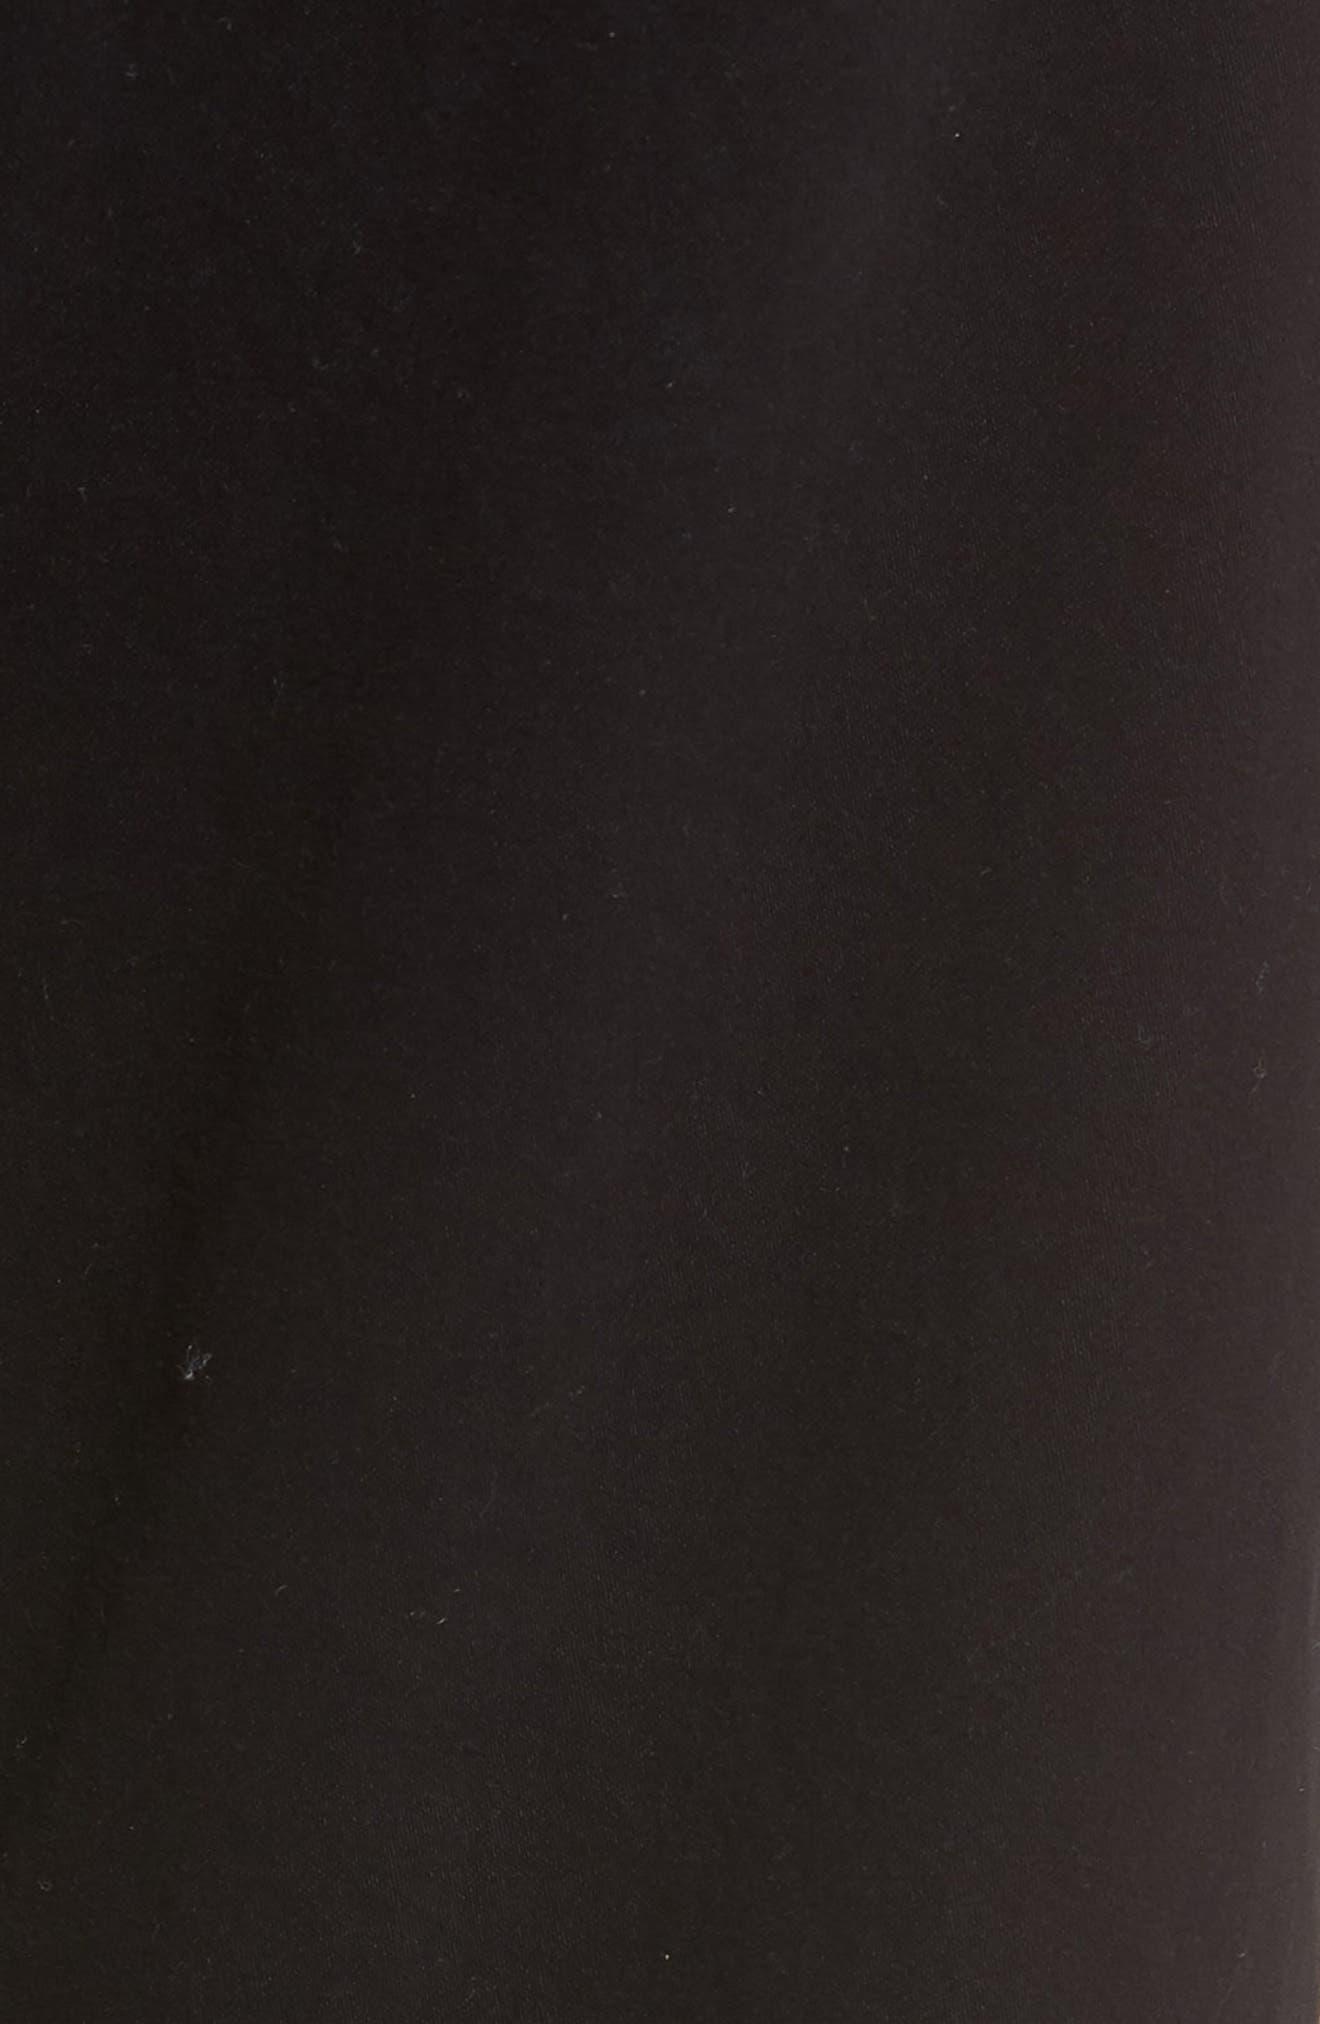 Graduate SUD Slim Straight Leg Pants,                             Alternate thumbnail 6, color,                             BLACK